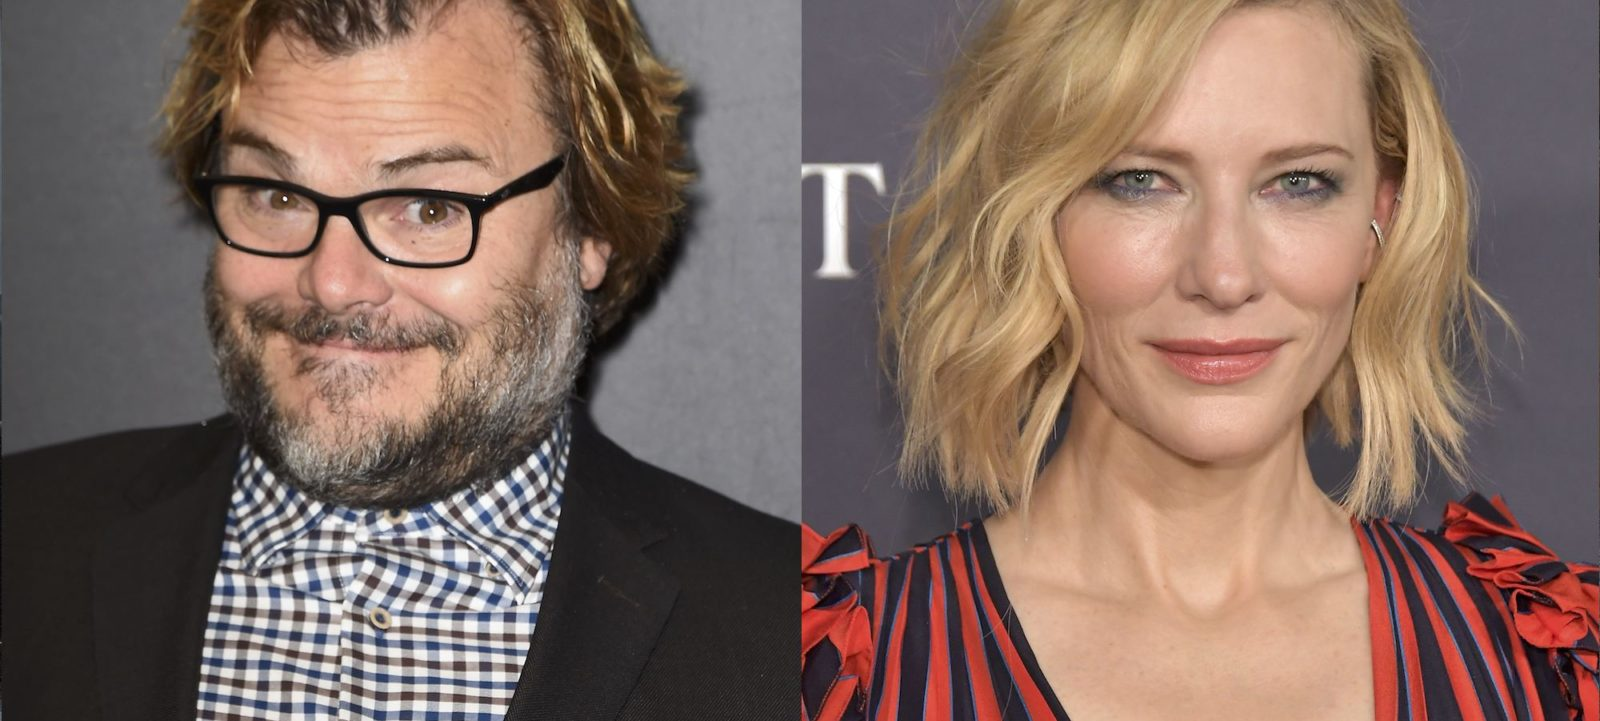 Jack Black and Cate Blanchett